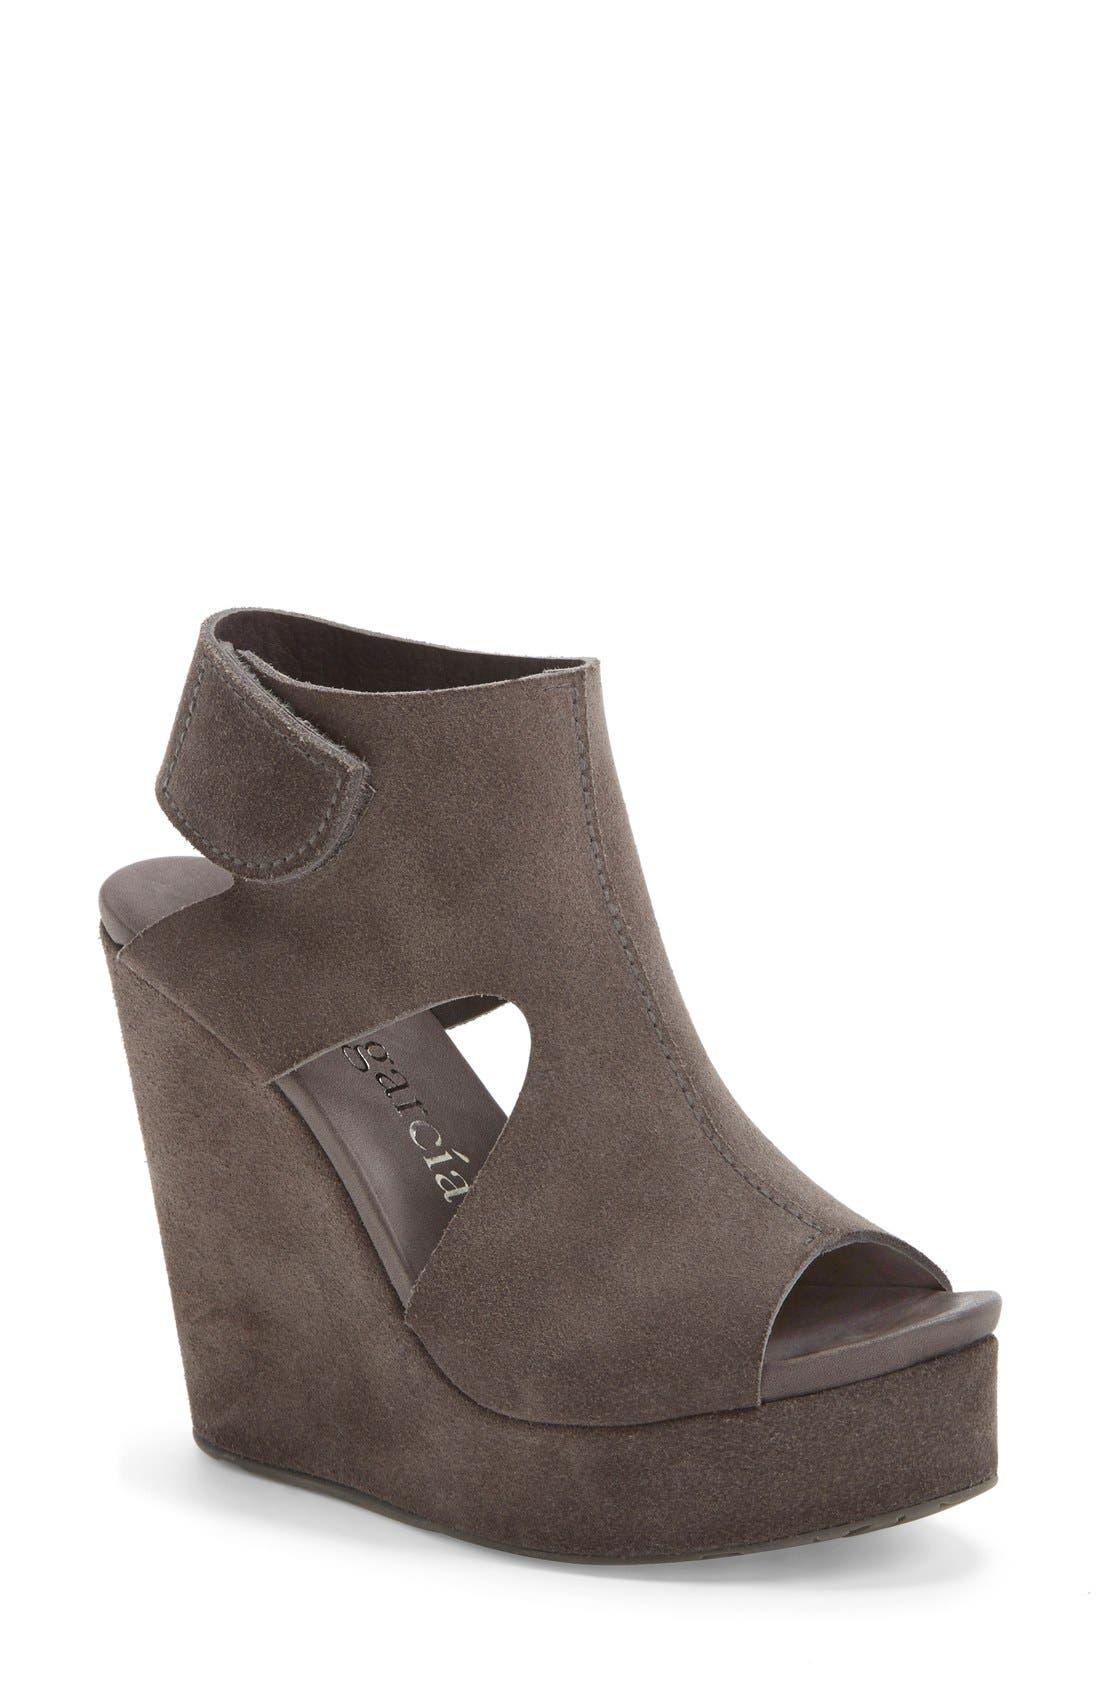 Main Image - Pedro Garcia 'Terence' Platform Wedge Sandal (Women) (Nordstrom Exclusive)